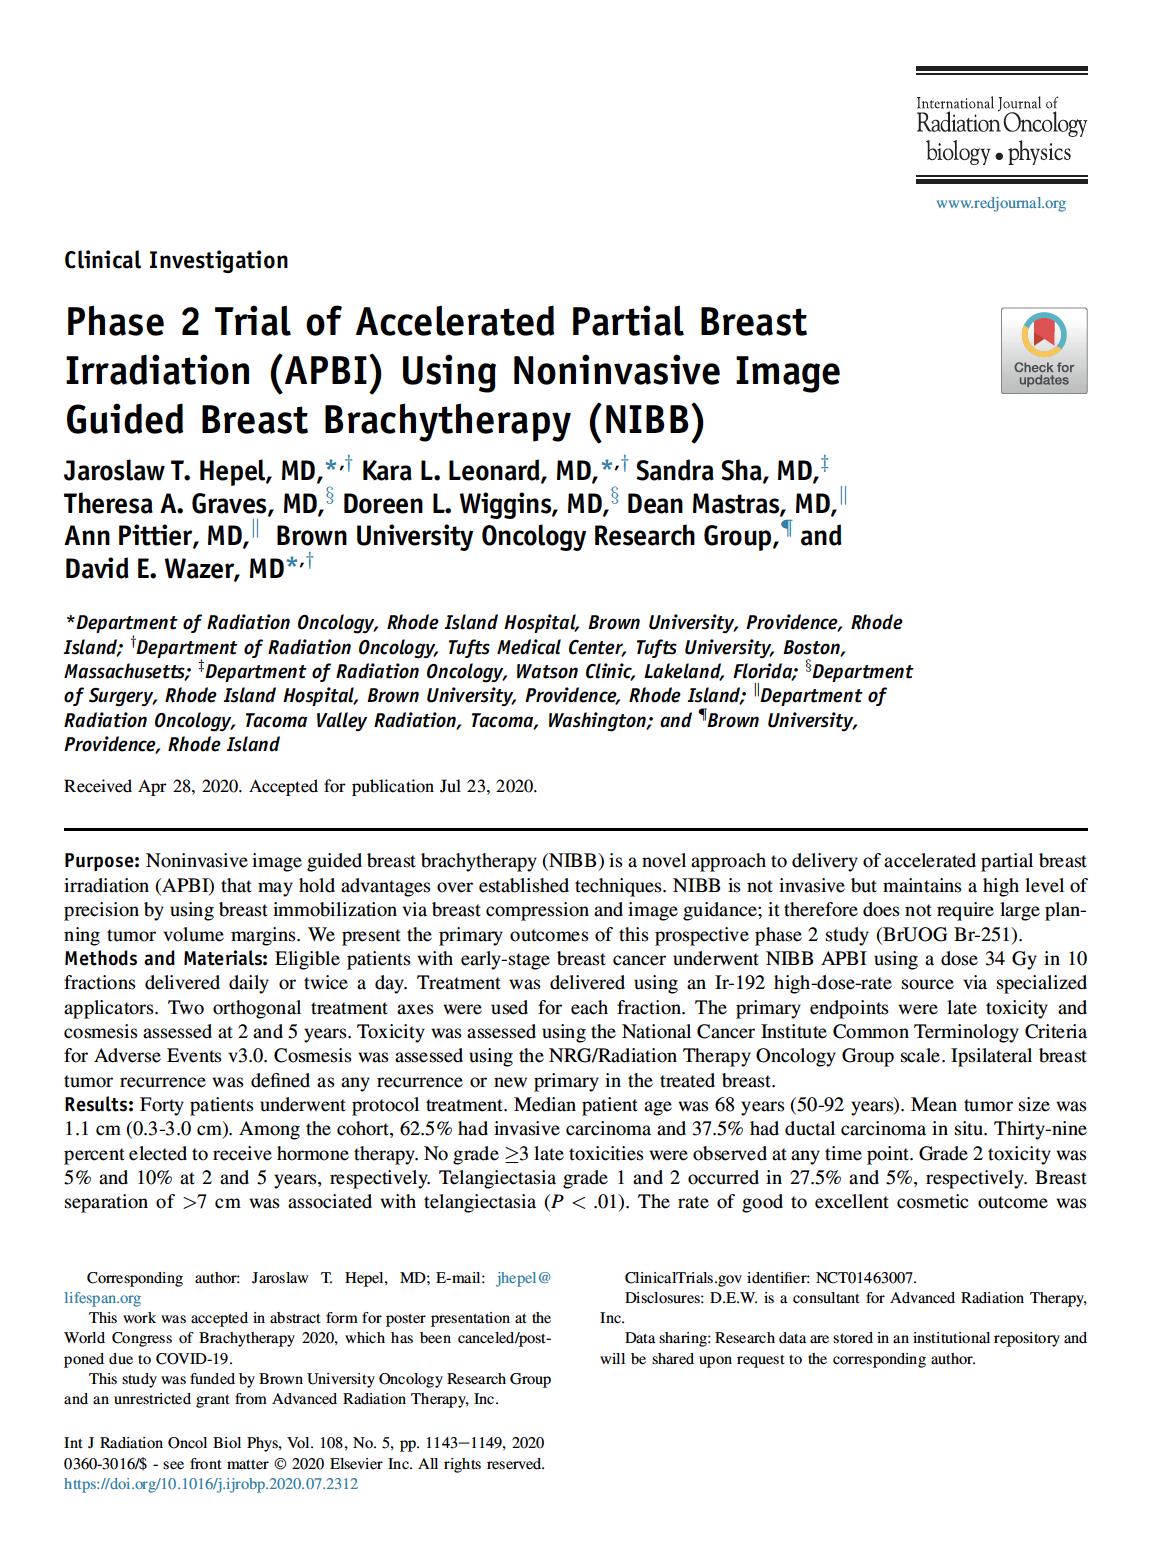 Dr. Hepel phase II APBI publication